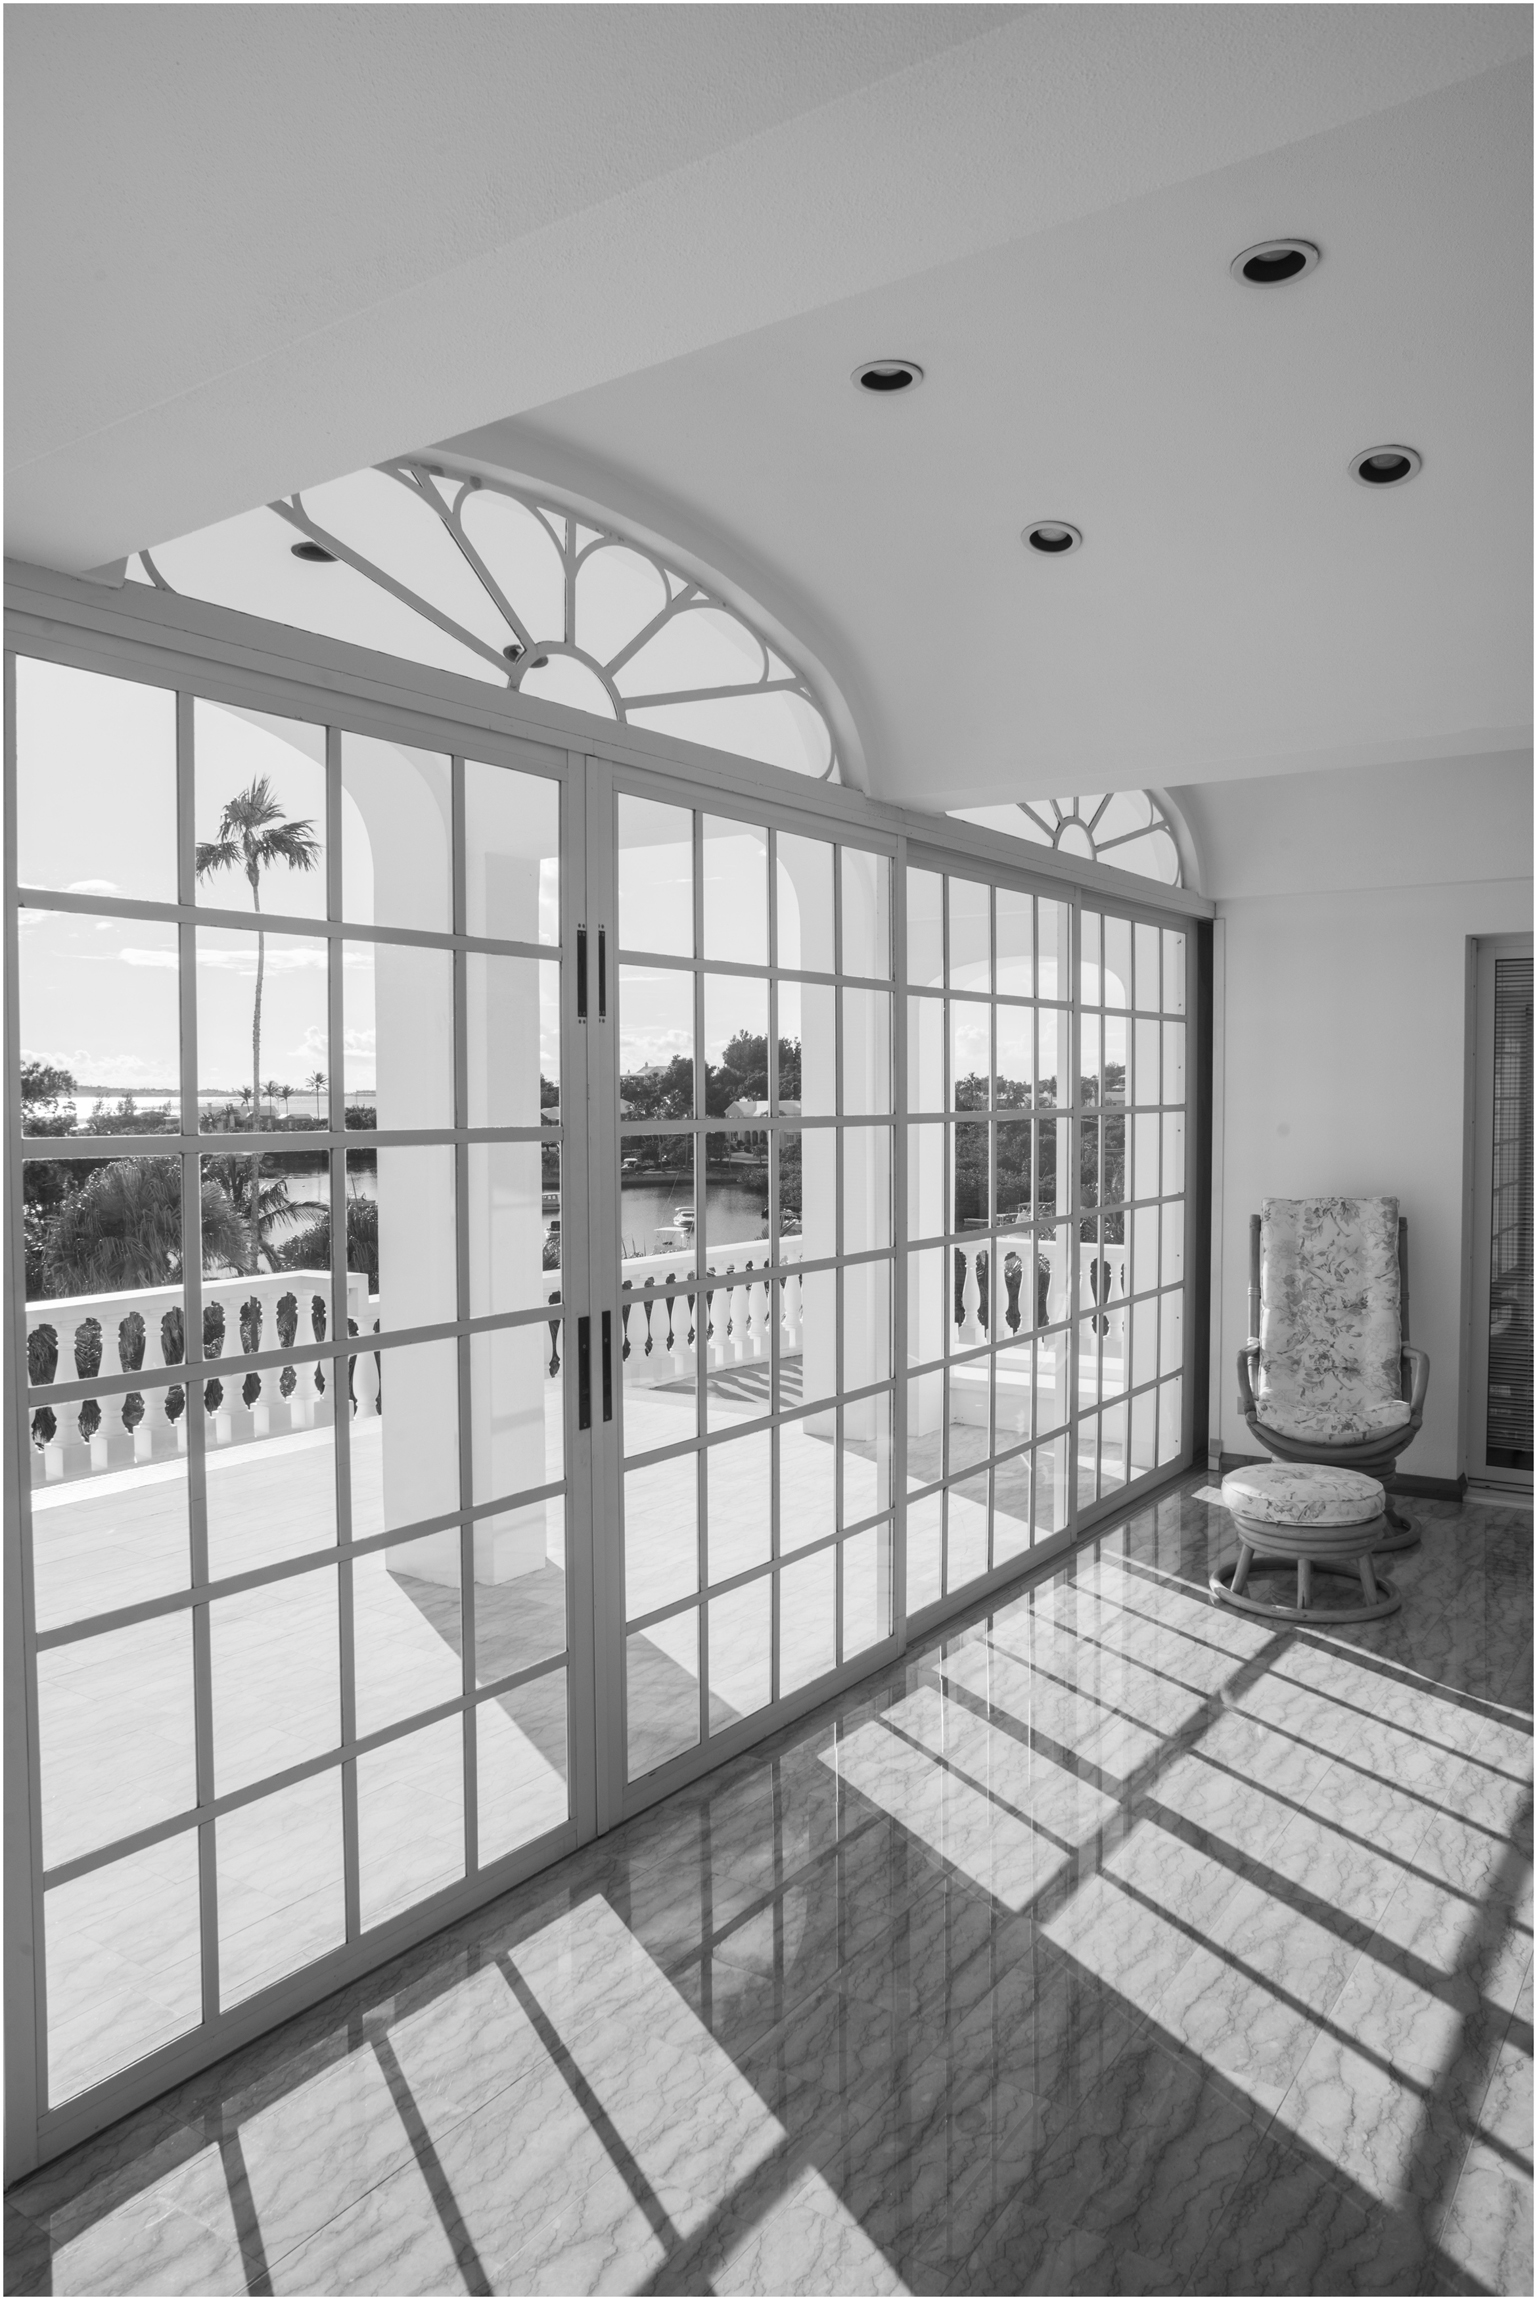 ©FianderFoto_Architecture_Bermuda_Palomera_010.jpg